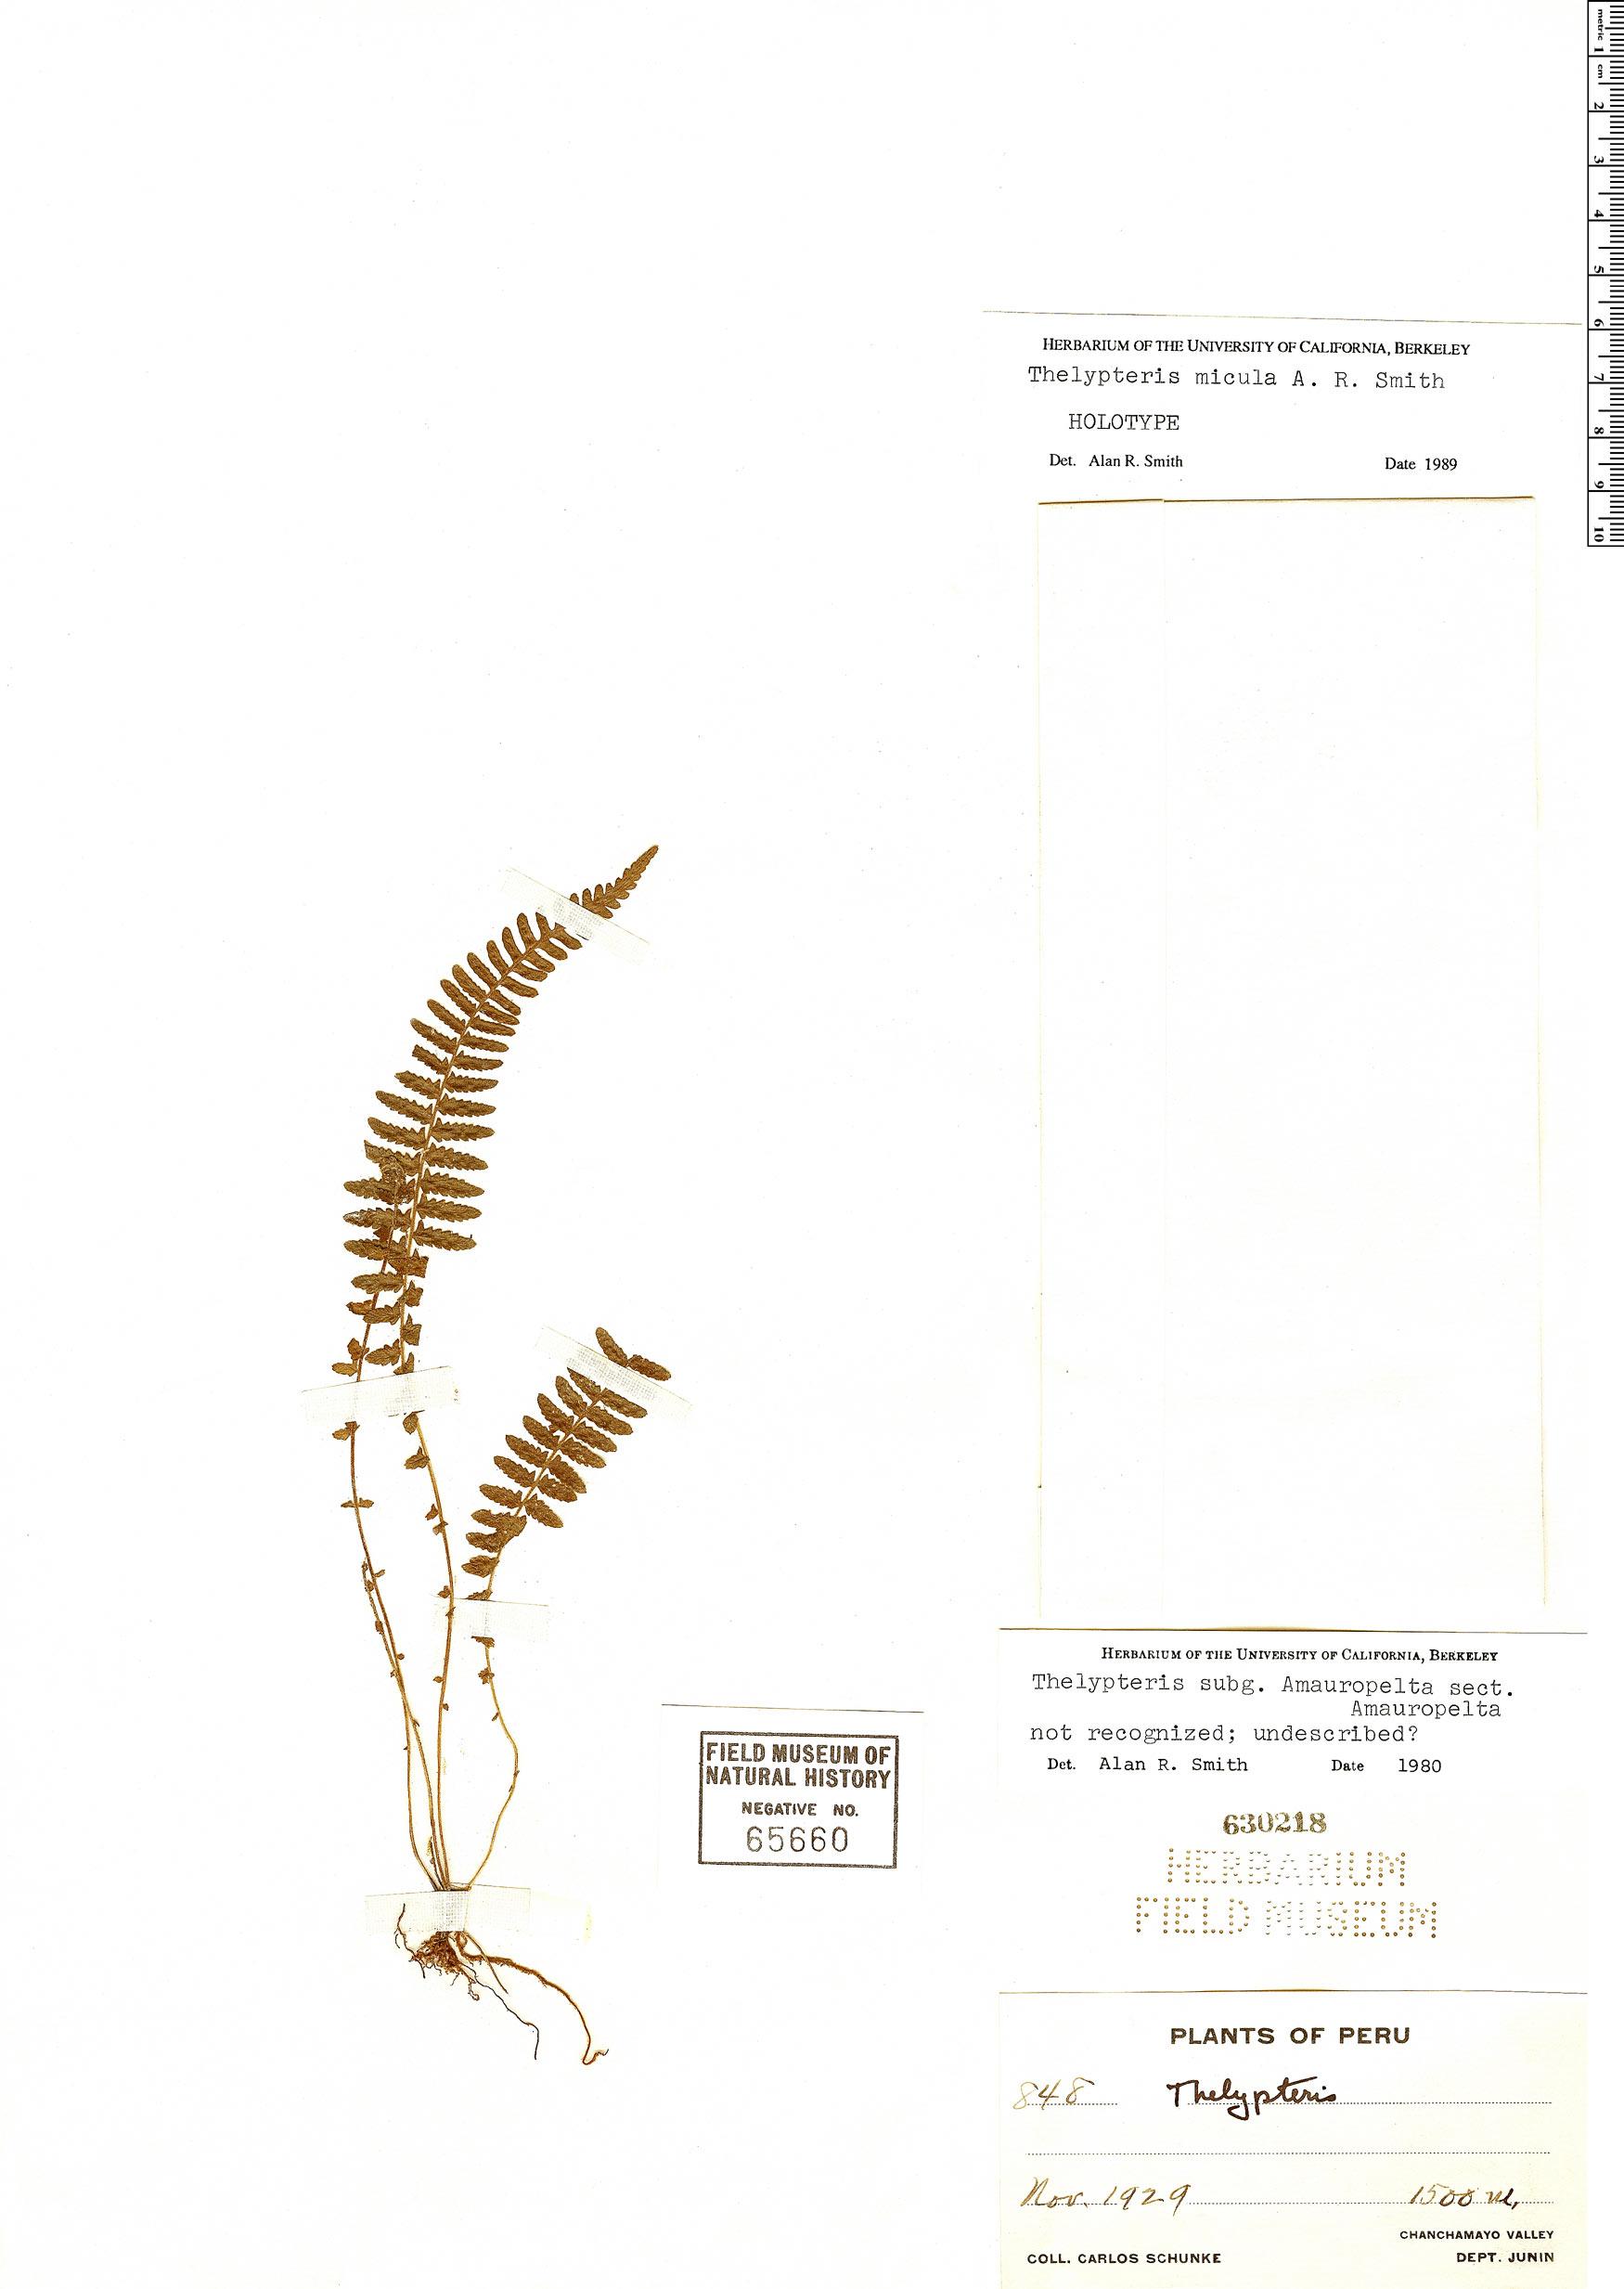 Specimen: Thelypteris micula